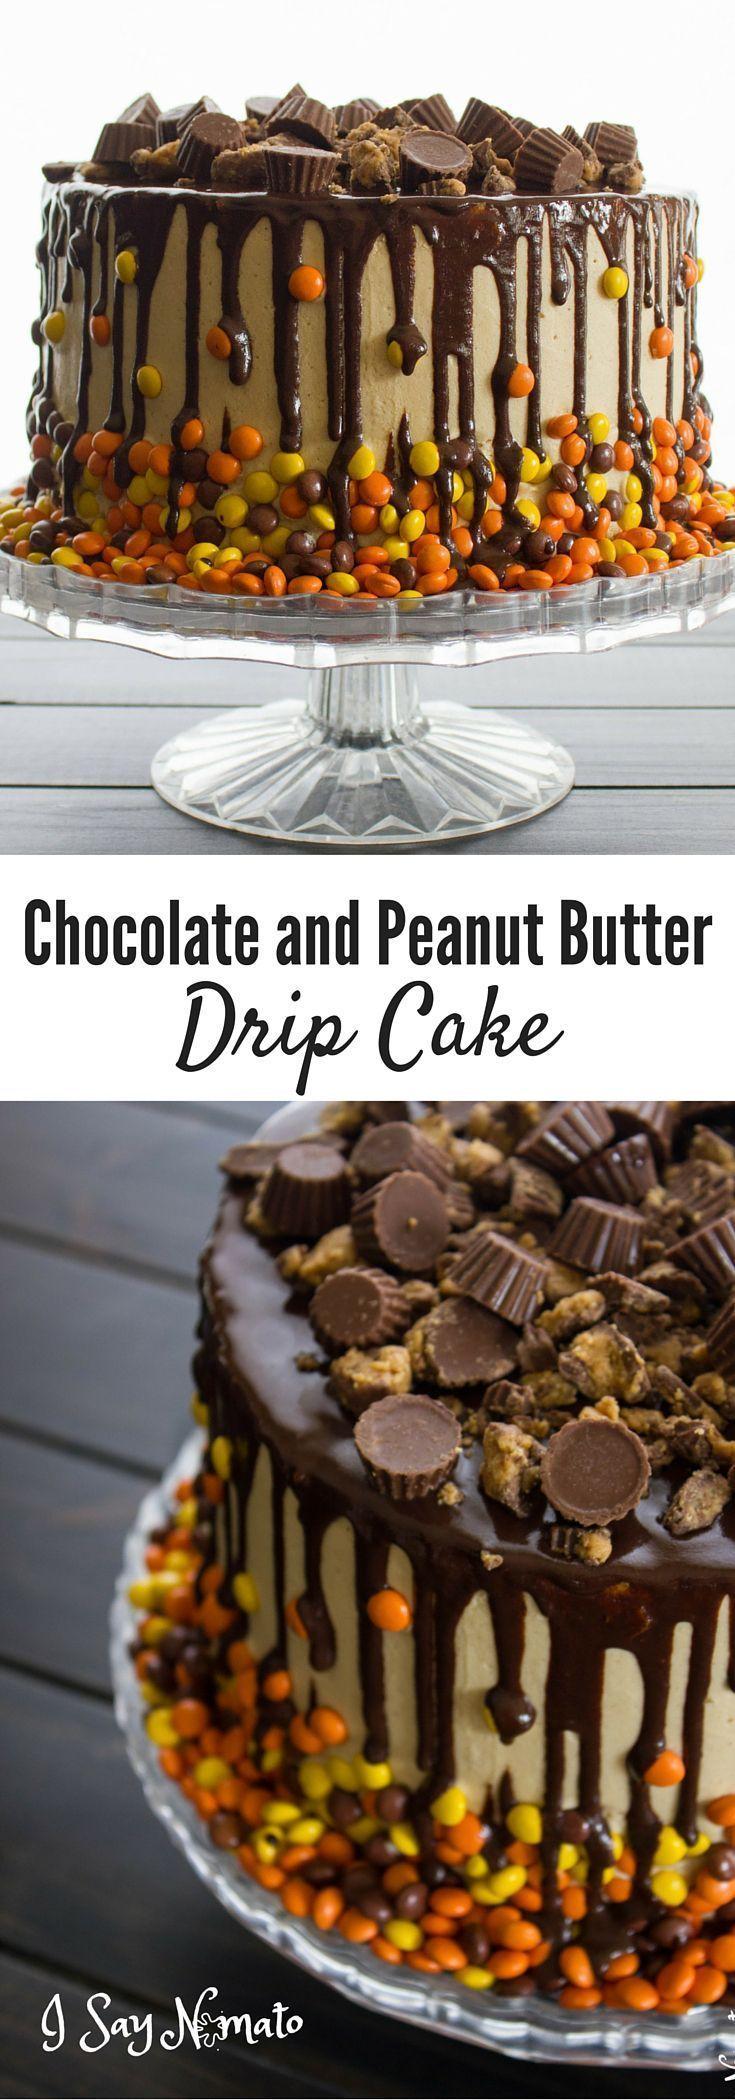 cocoa cocoa Chocolate and Peanut  Chocolate and Peanut Butter spread Drip Cake - I Say Nomato Nightshade Free Food Blog